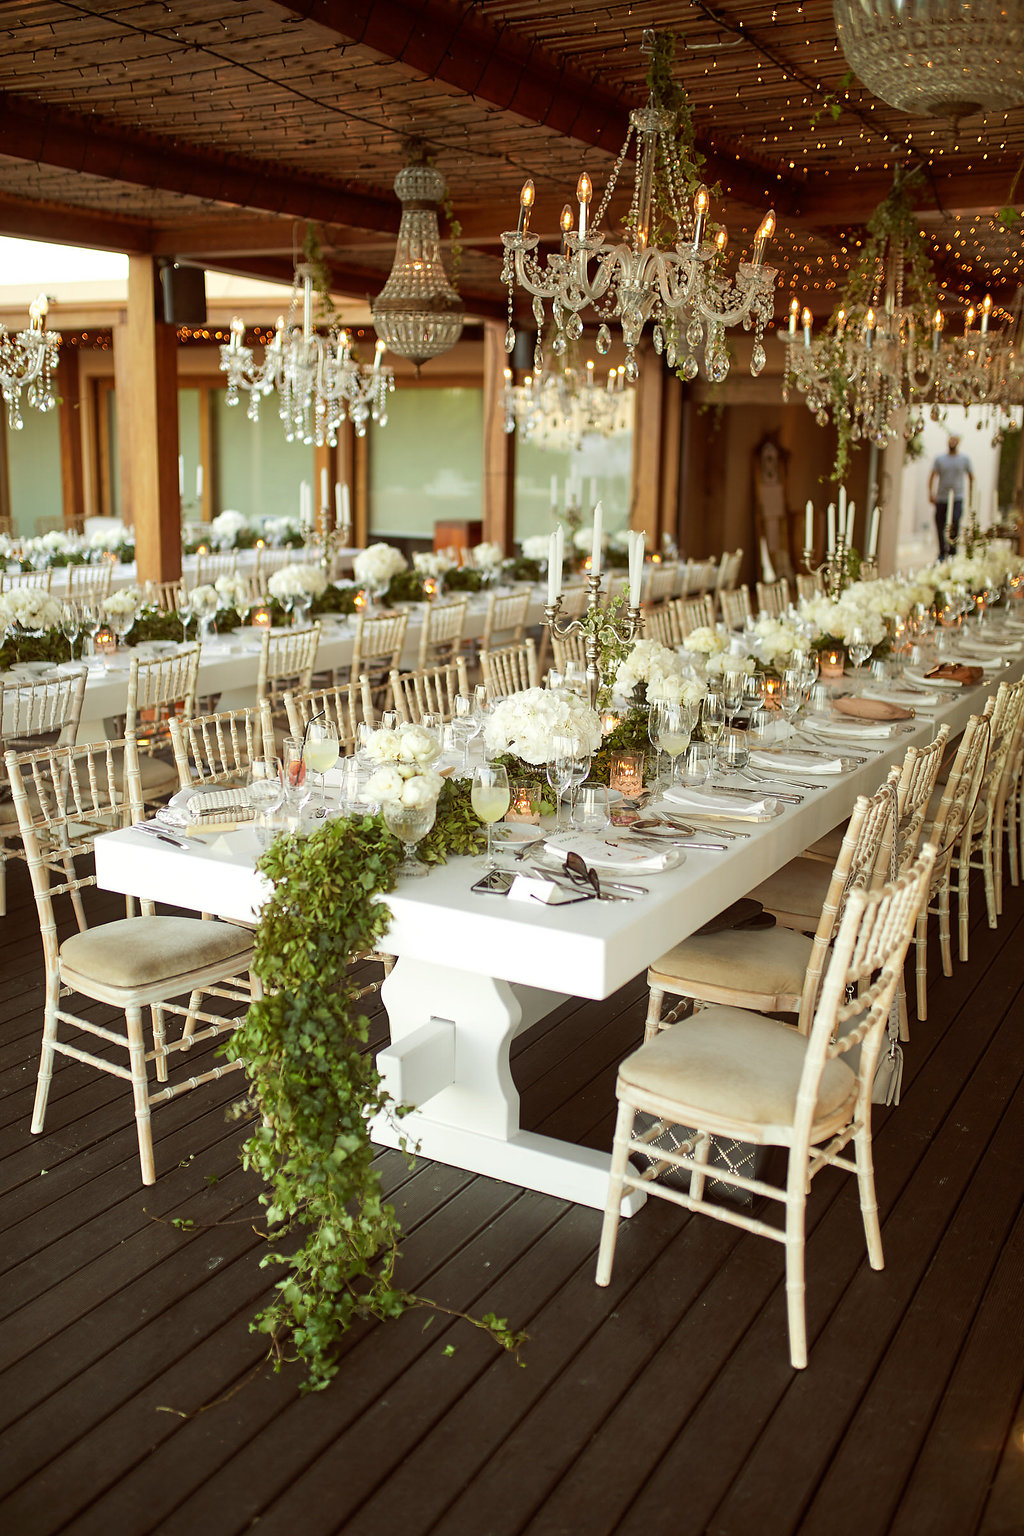 romantic wedding receptions - photo by Sotiris Tsakanikas http://ruffledblog.com/chic-sunset-wedding-on-the-athens-riviera